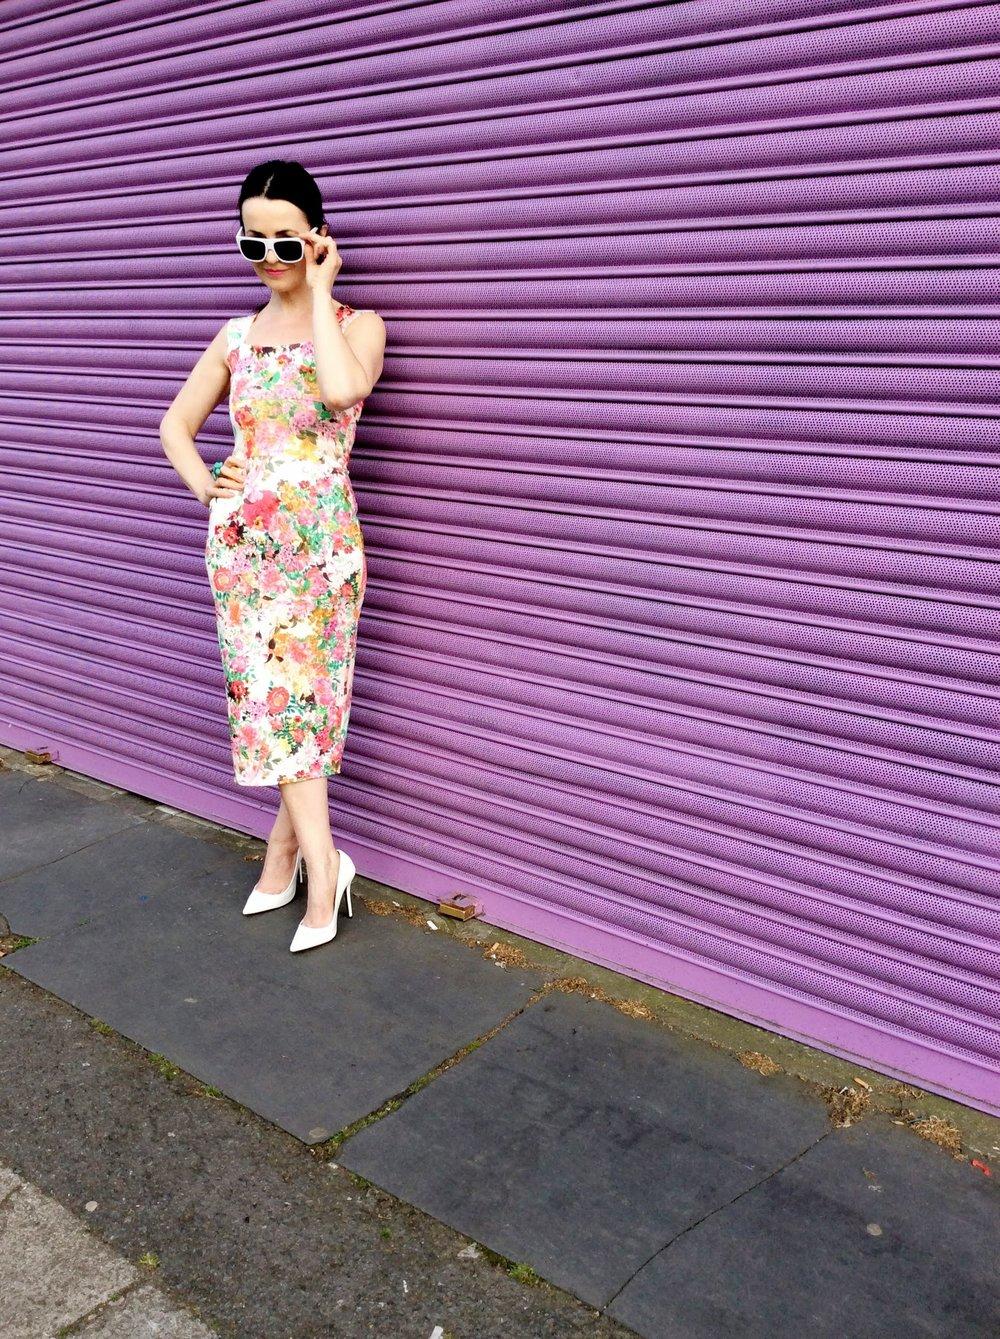 Floral Print Wiggle Dress!